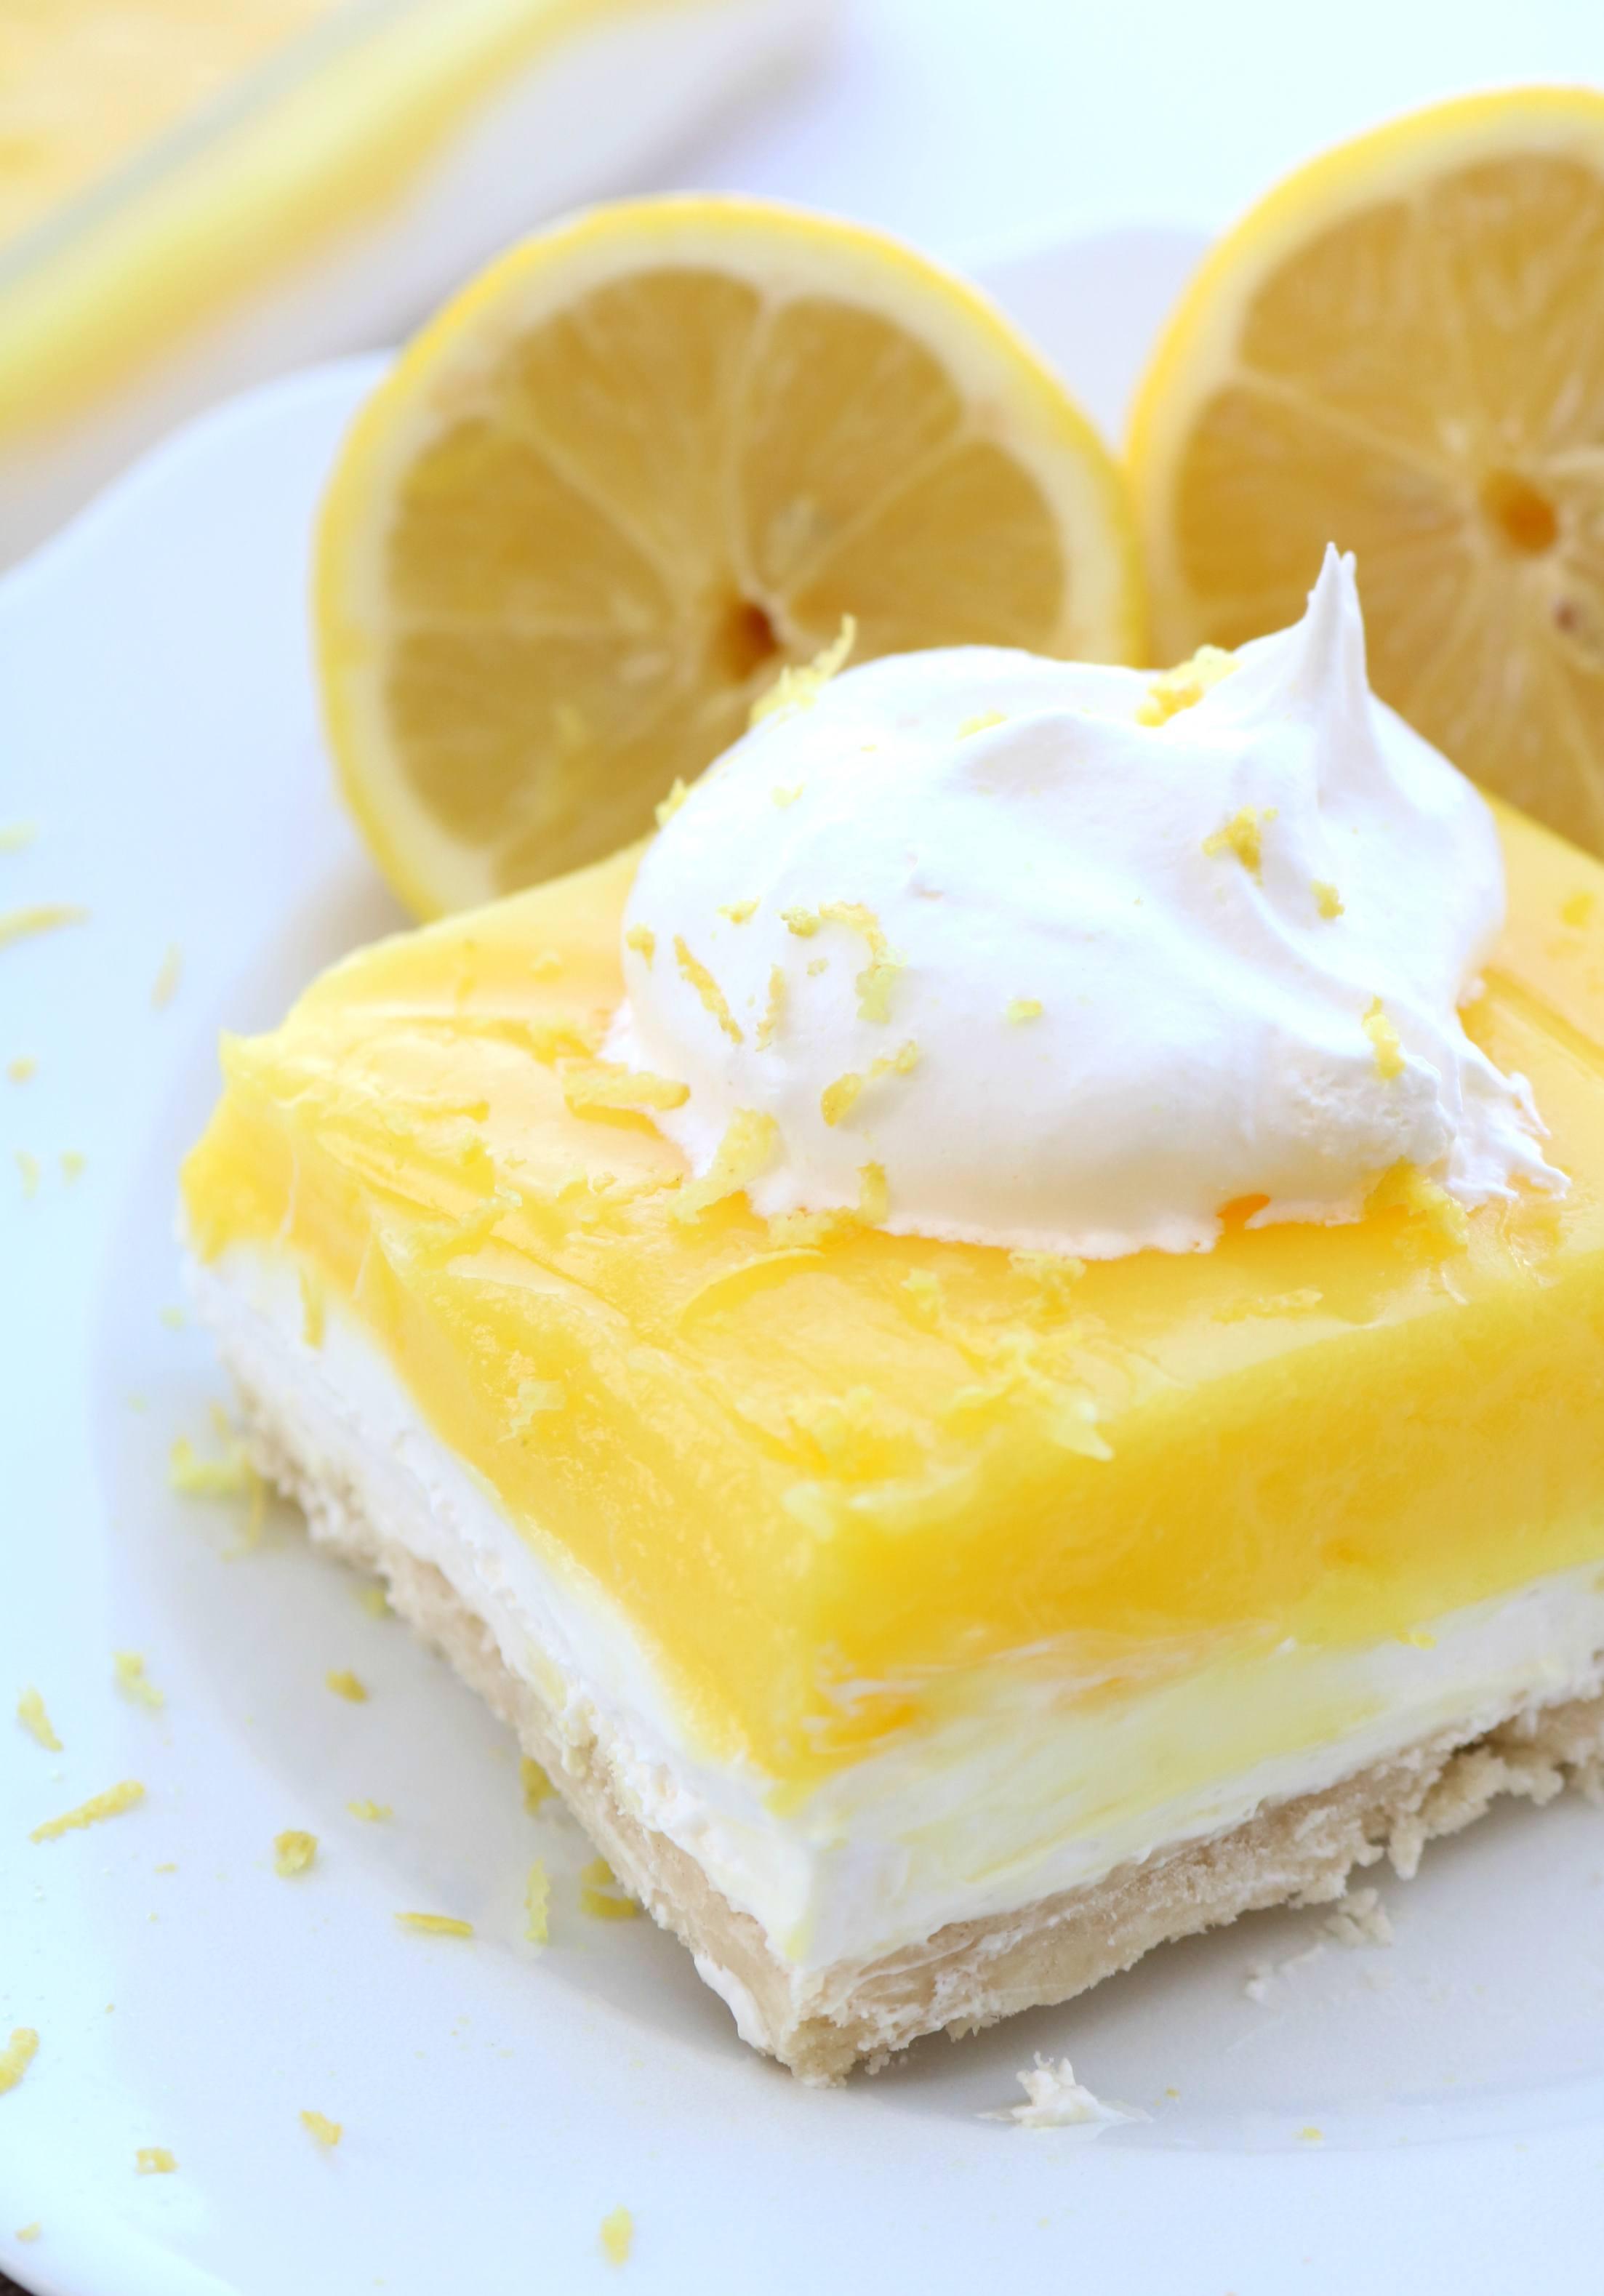 Layered Lemon Dessert - Sugar n' Spice Gals